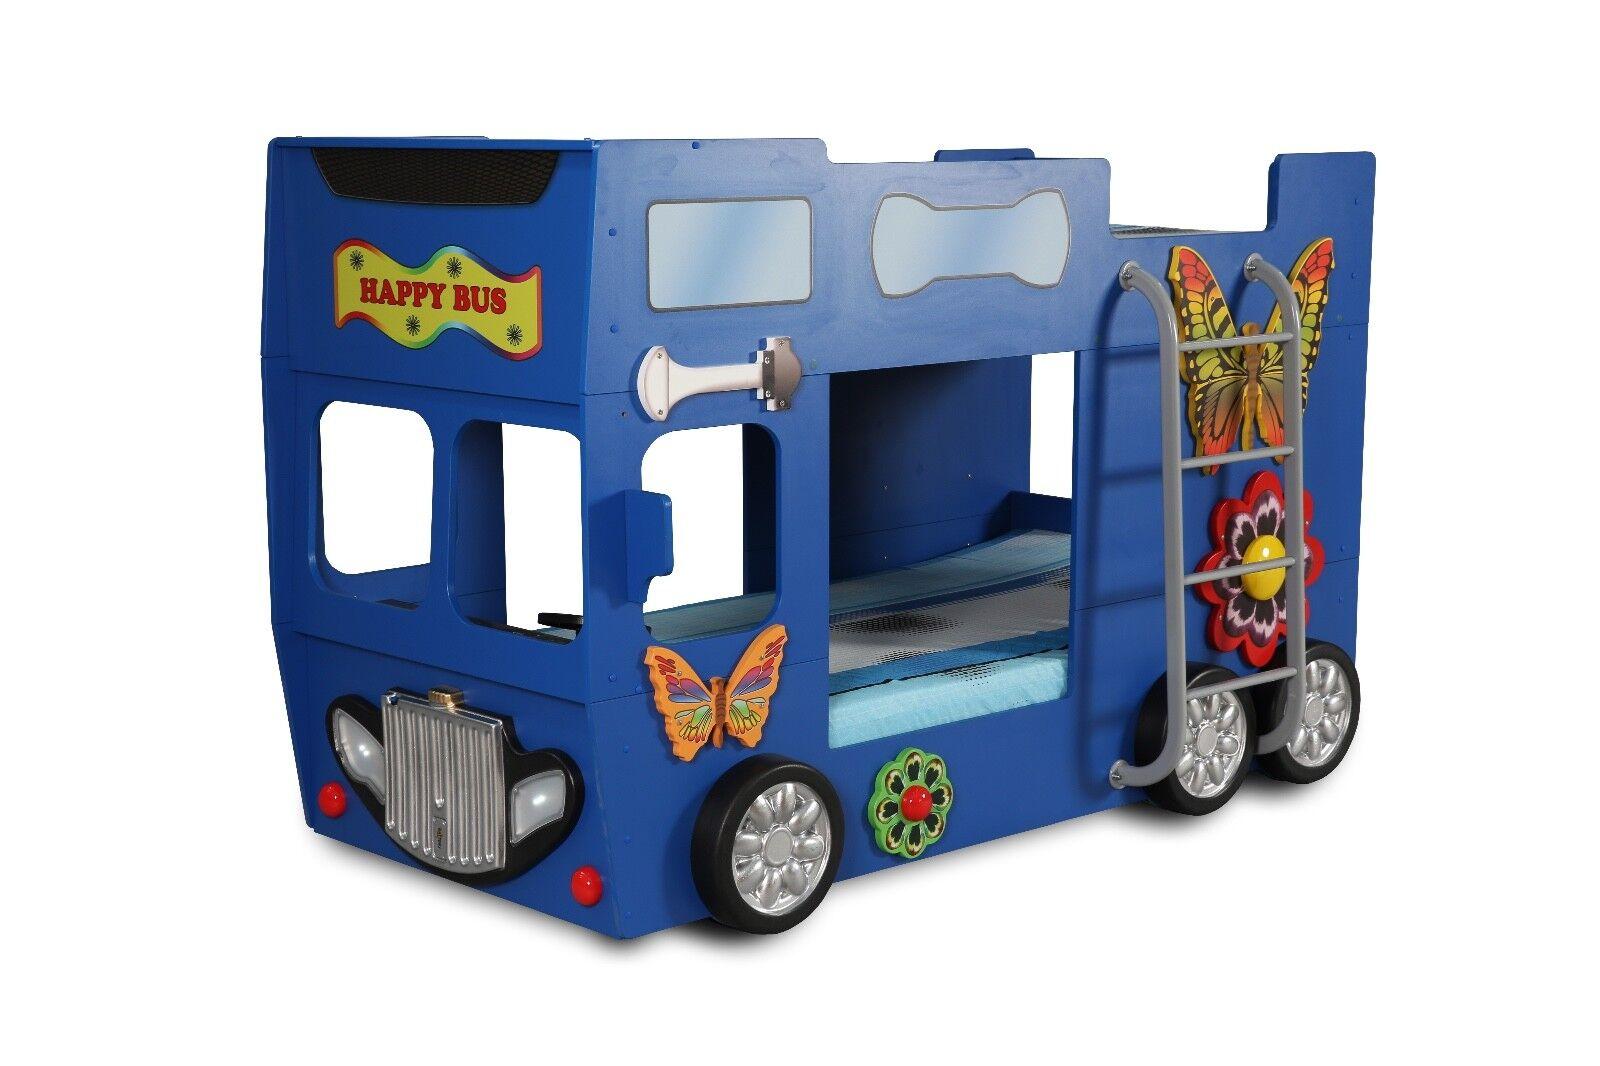 Etagenbett Bus Gebraucht : Kinderzimmer bett kinderbett etagenbett happy bus